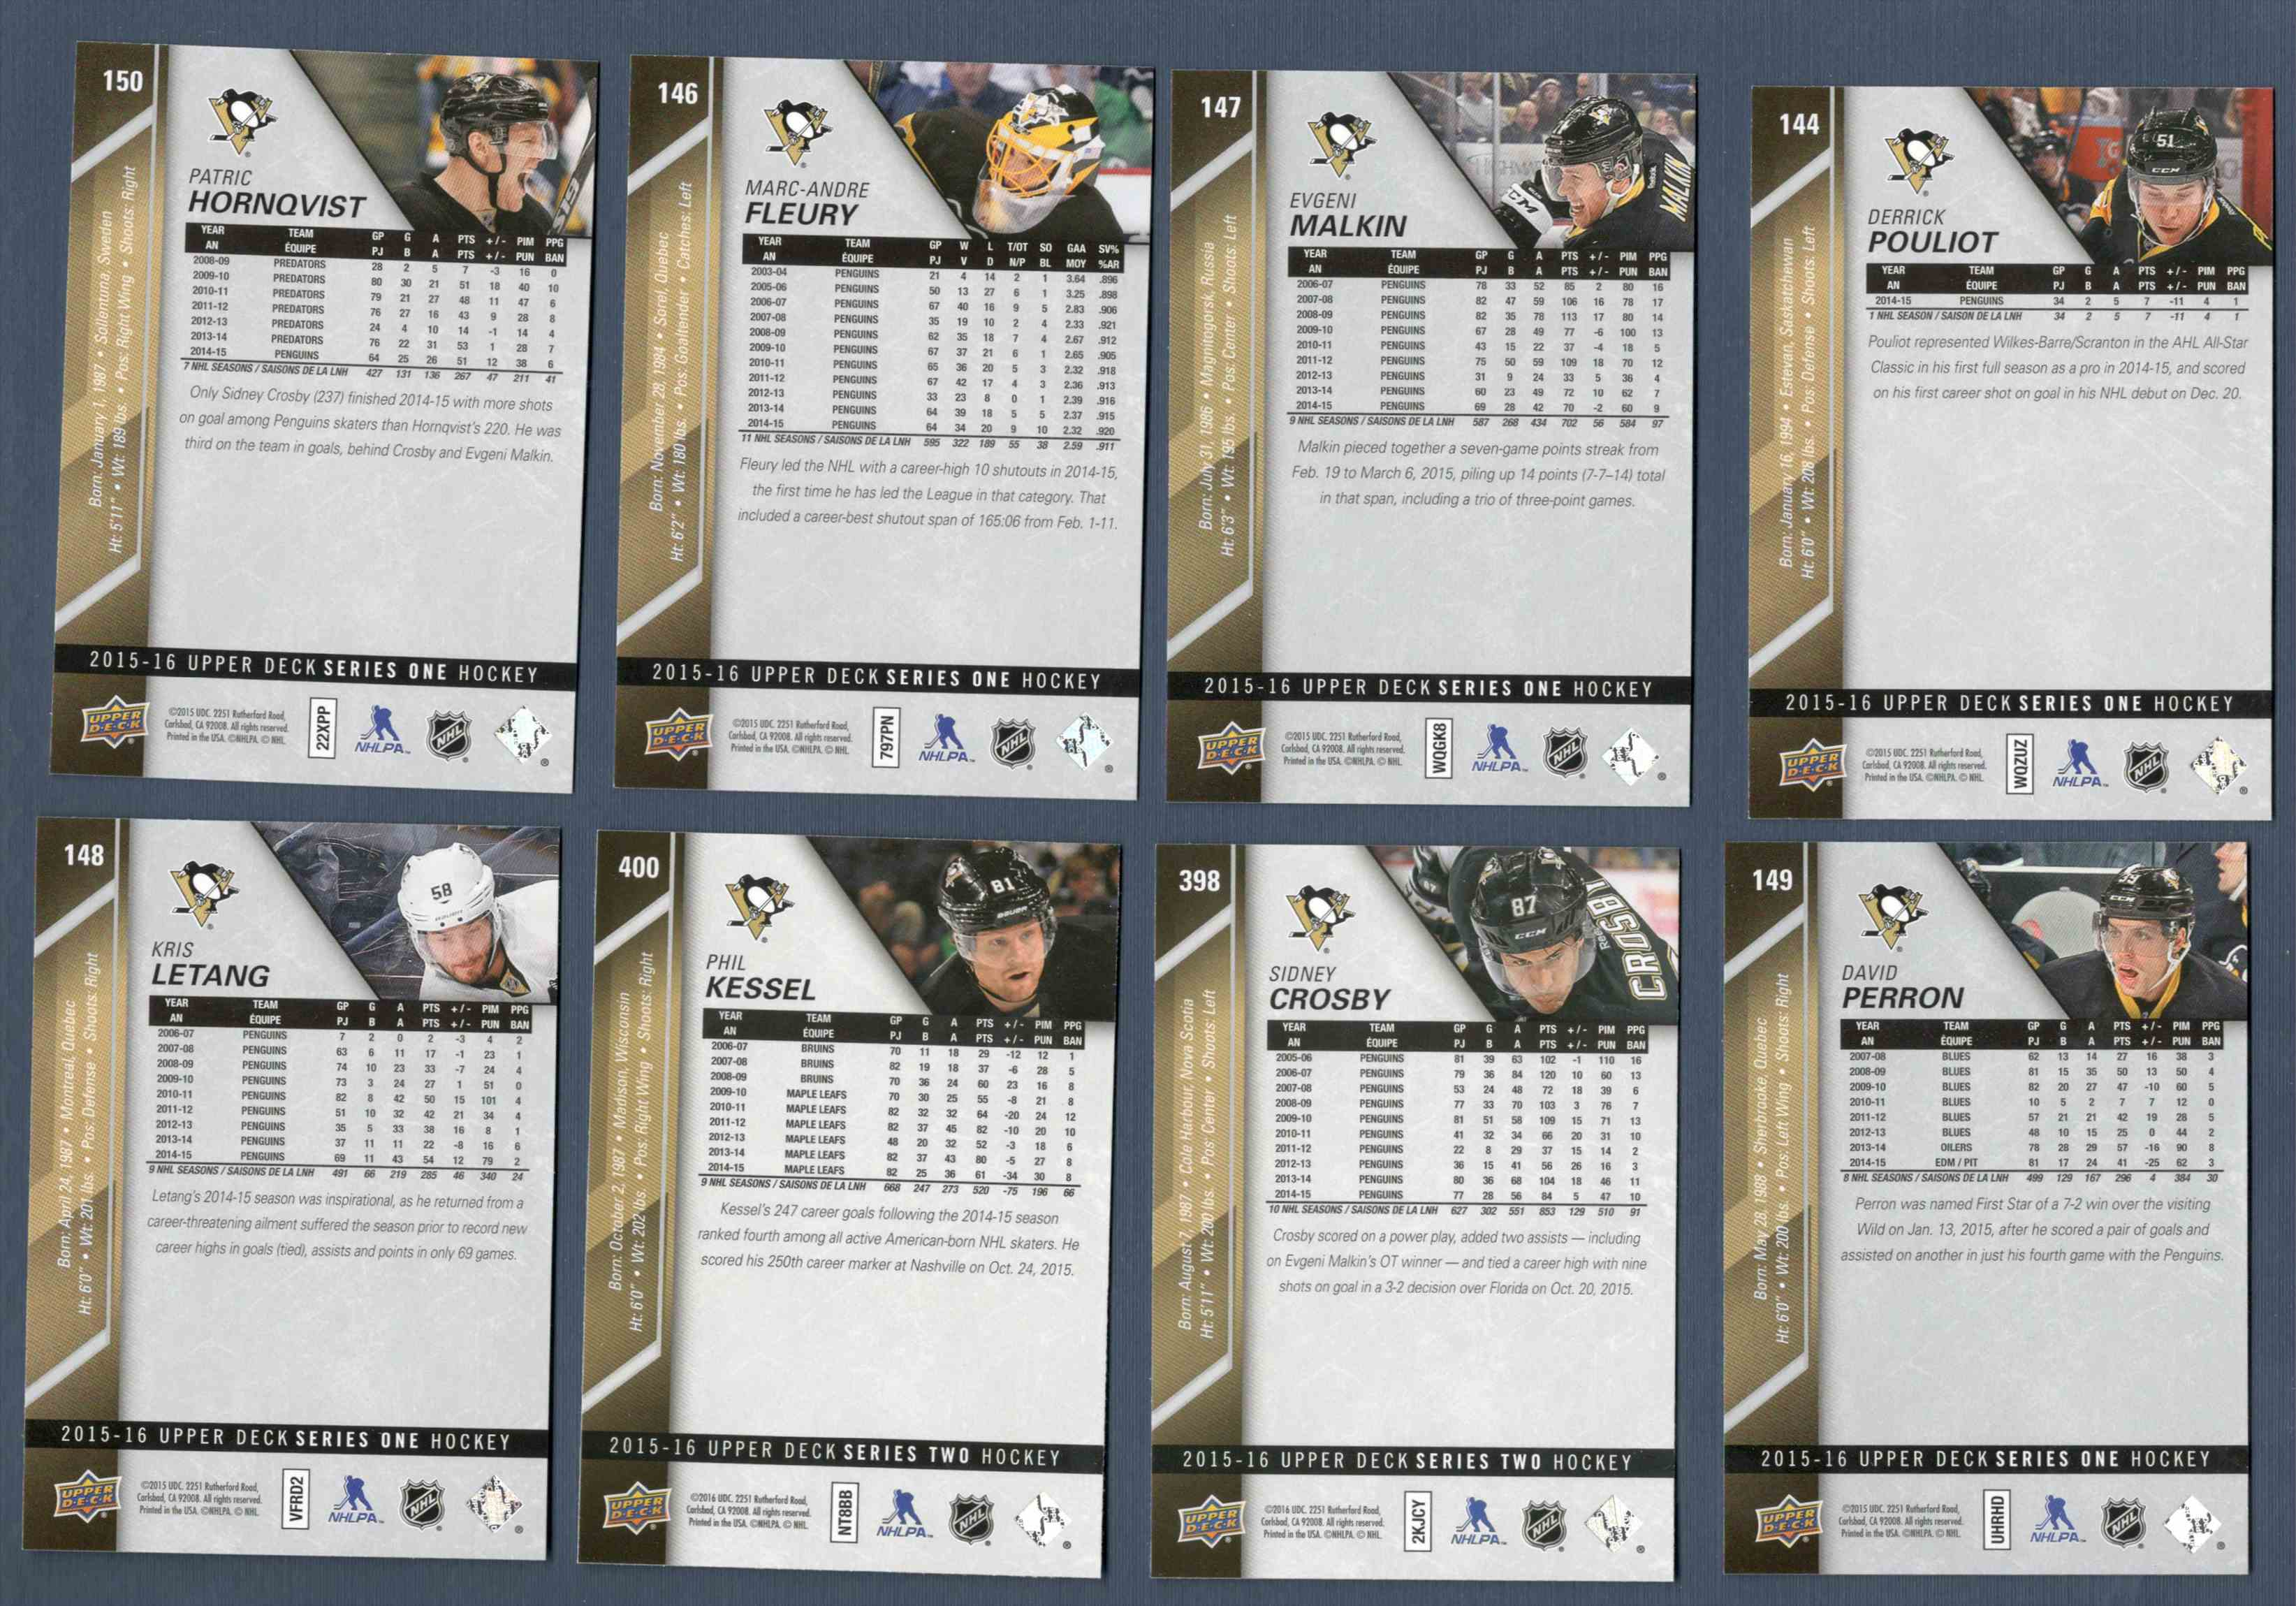 2015-16 Upper Deck Pittsburgh Team #358 card back image